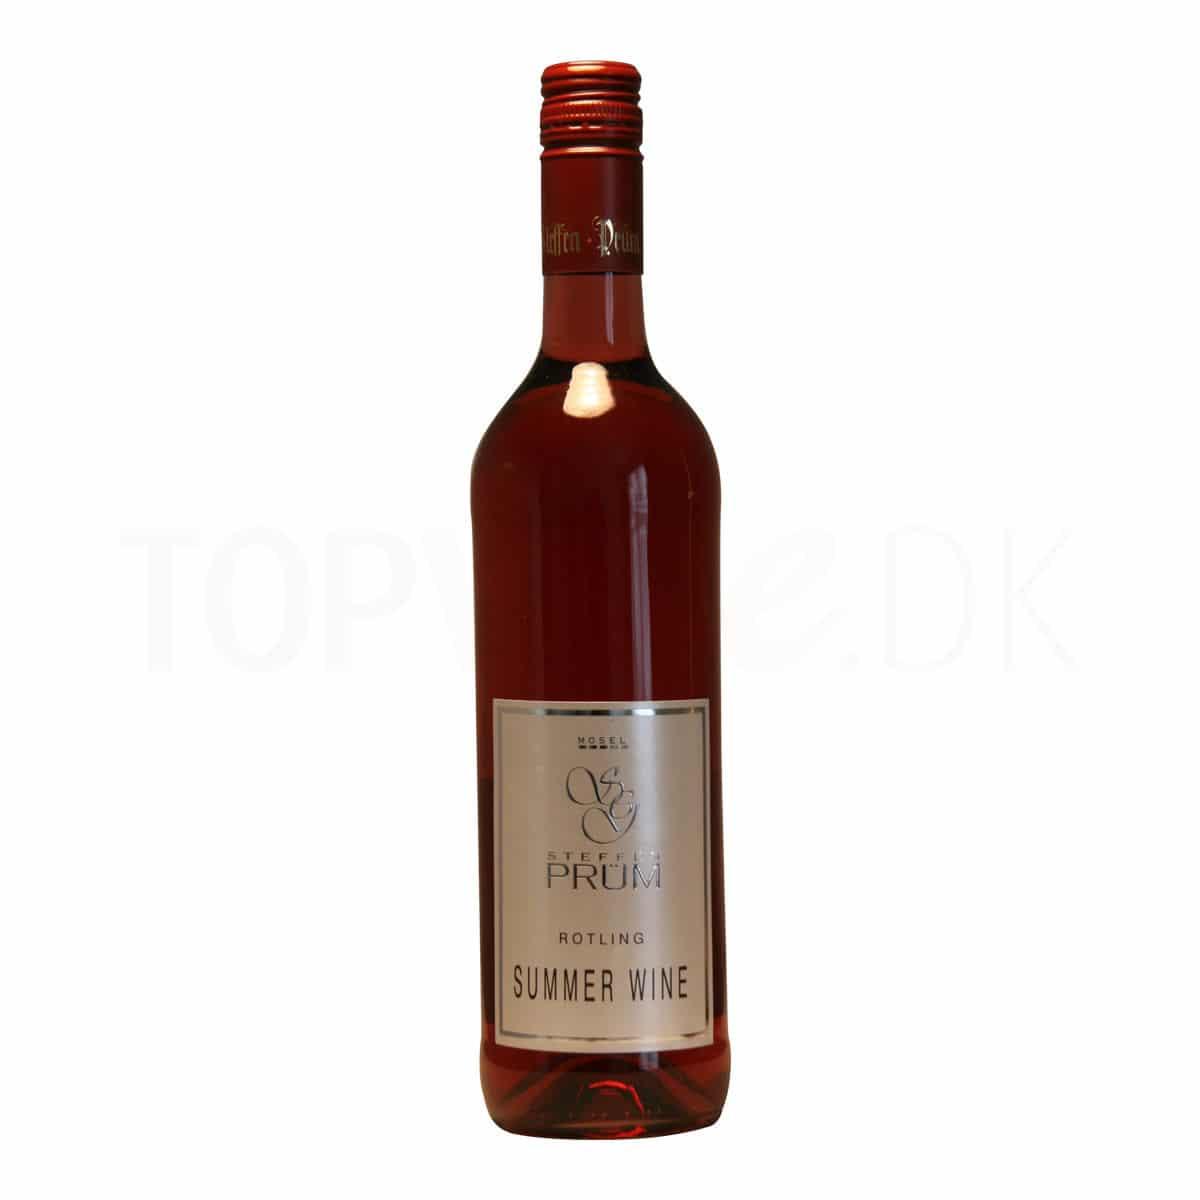 S.G. Pr_m Rotling Summer Wine 2017